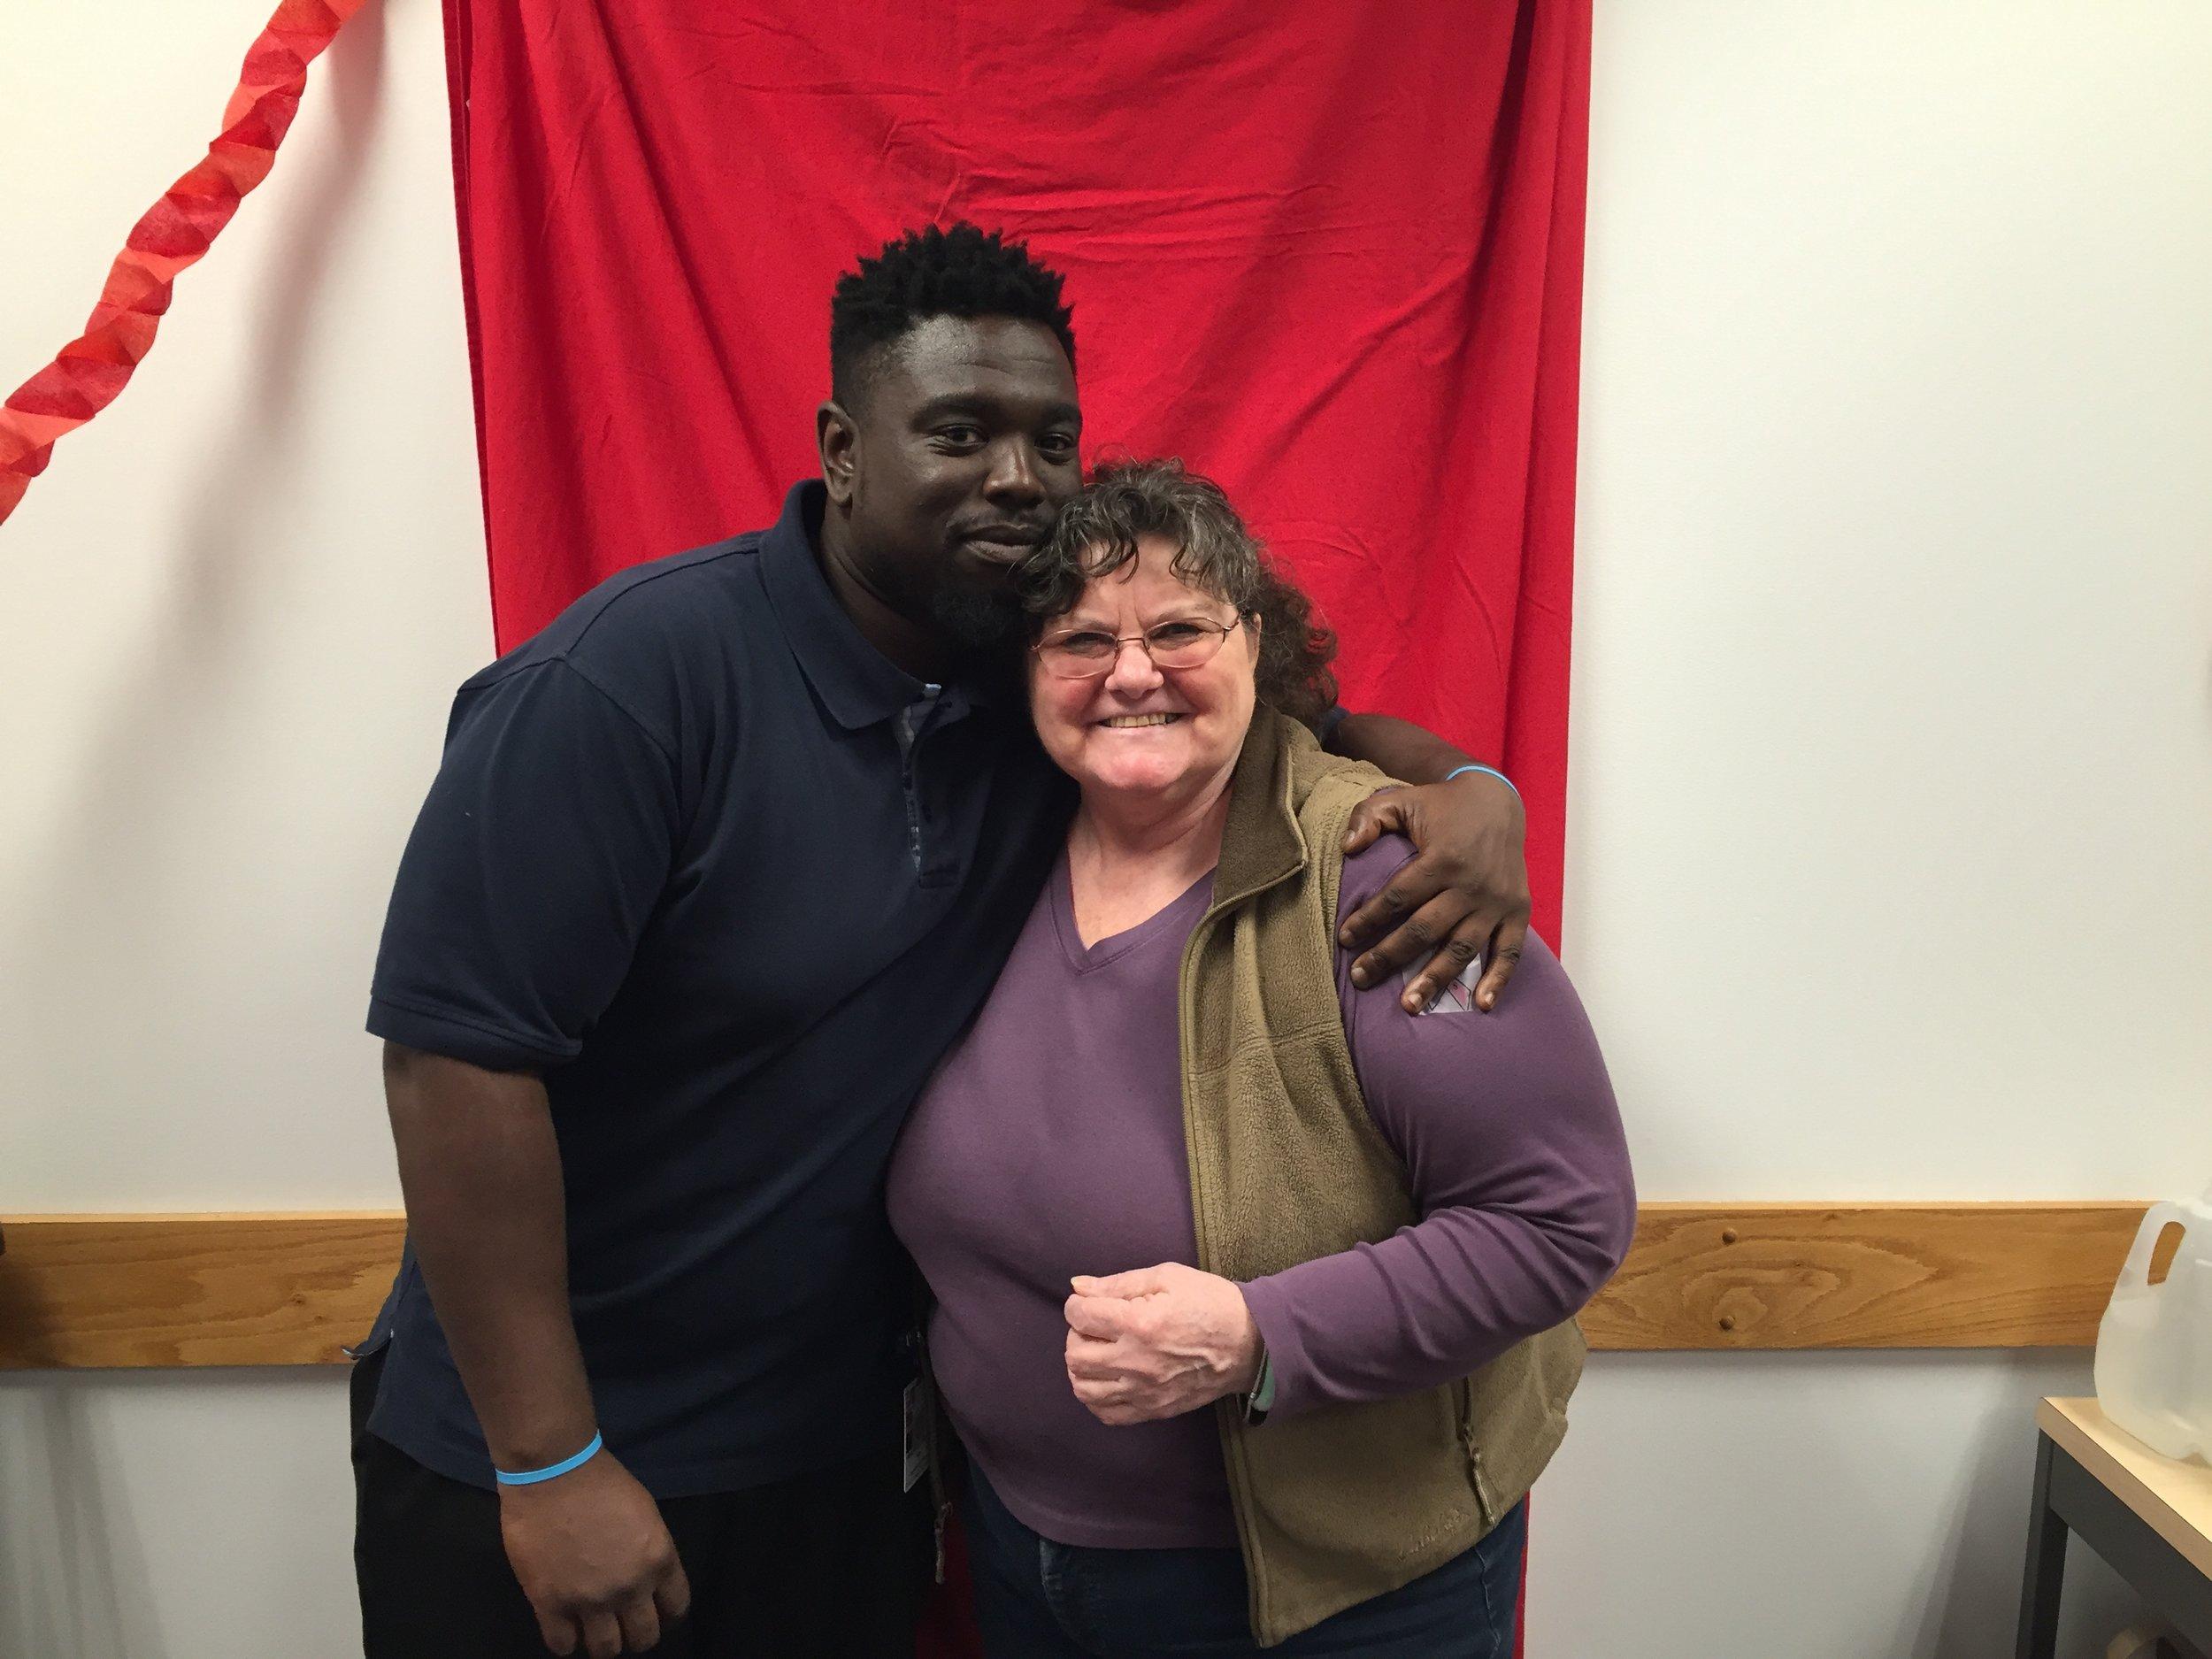 SHARE Executive Board Member Jameal Jackson & SHARE Rep Belinda O'Brien